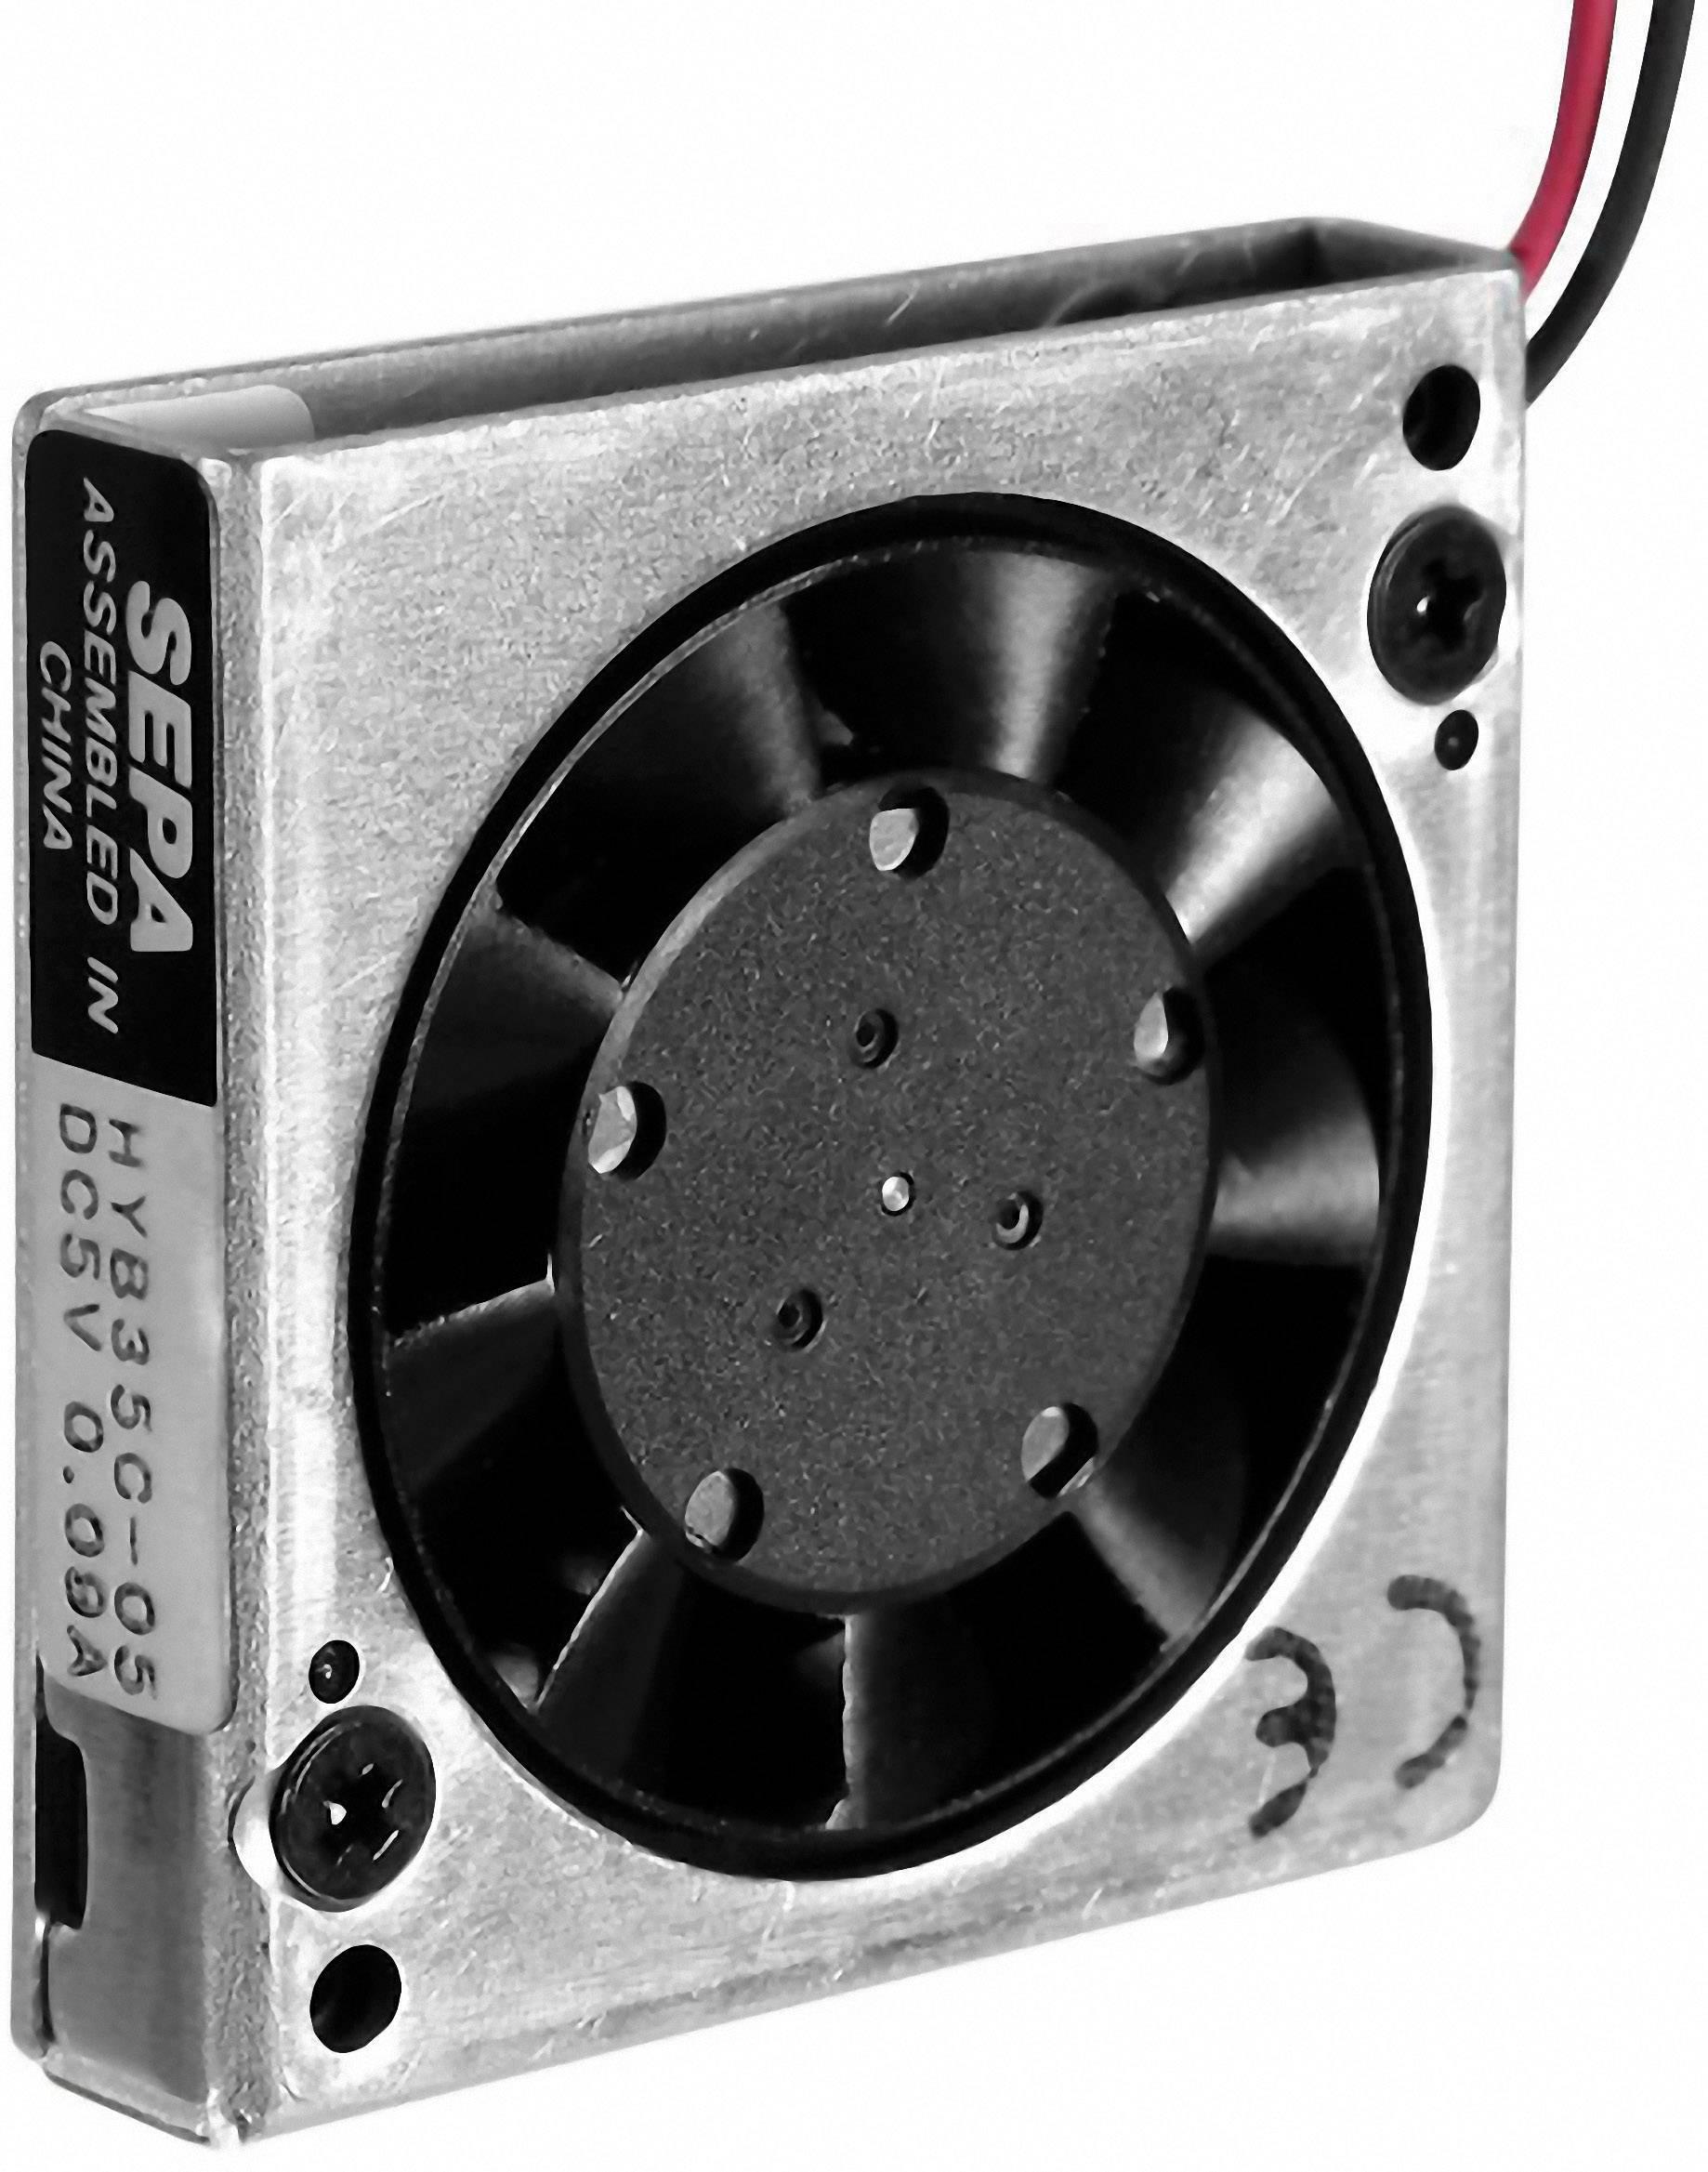 Axiálny ventilátor SEPA HYB35C05A 113531019, 5 V/DC, 27 dB, (d x š x v) 35 x 35 x 7.5 mm